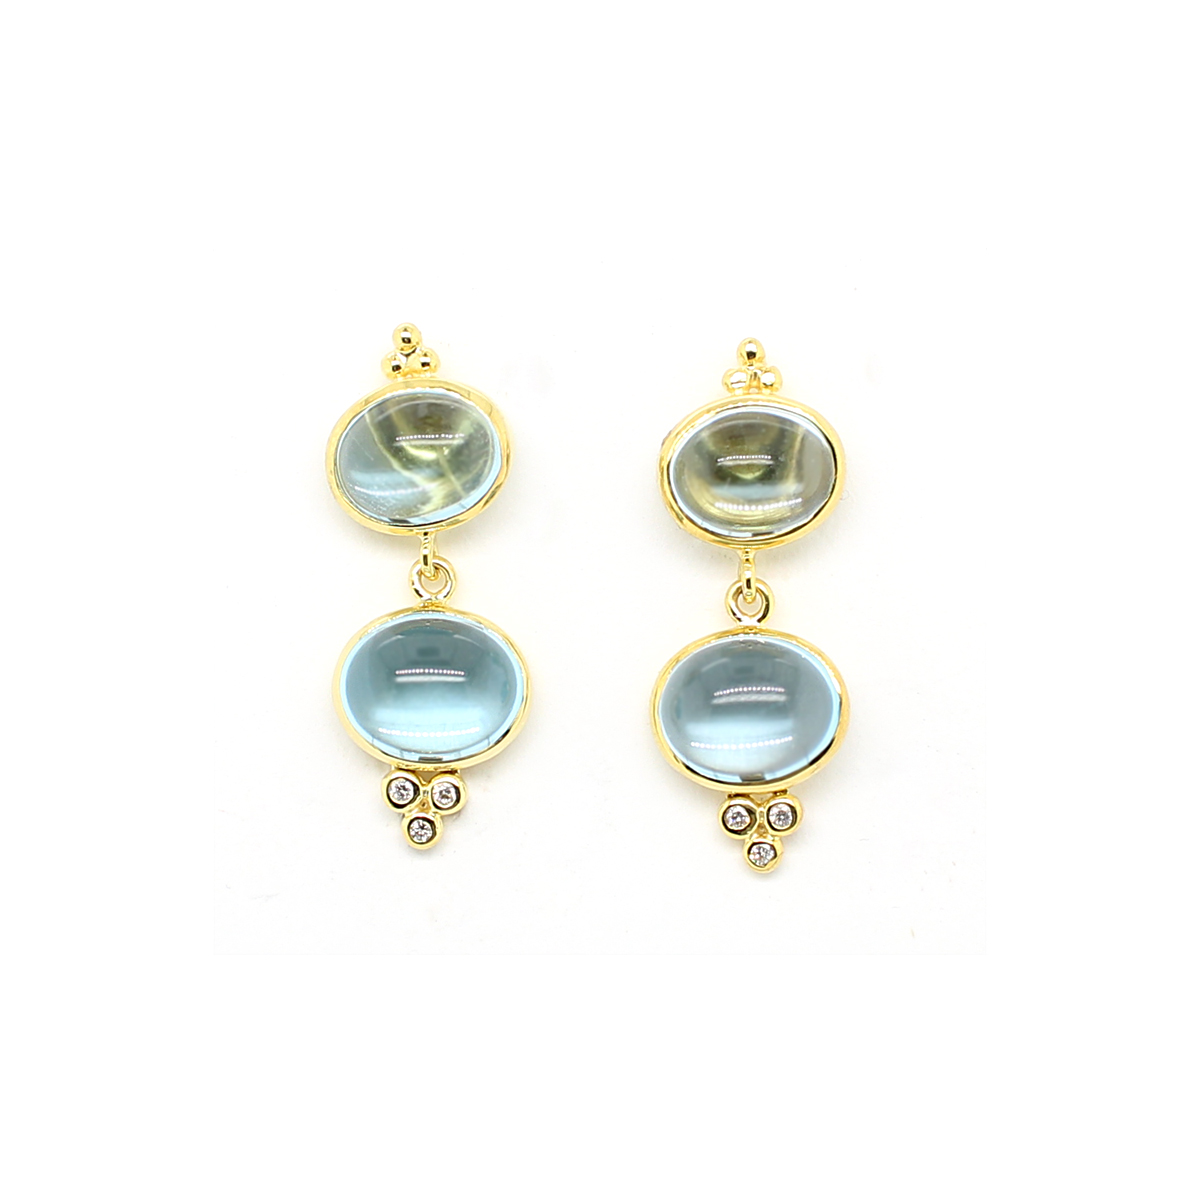 Mazza 14 Karat Yellow Gold Double Cabochon Blue Topaz and Diamond Earrings